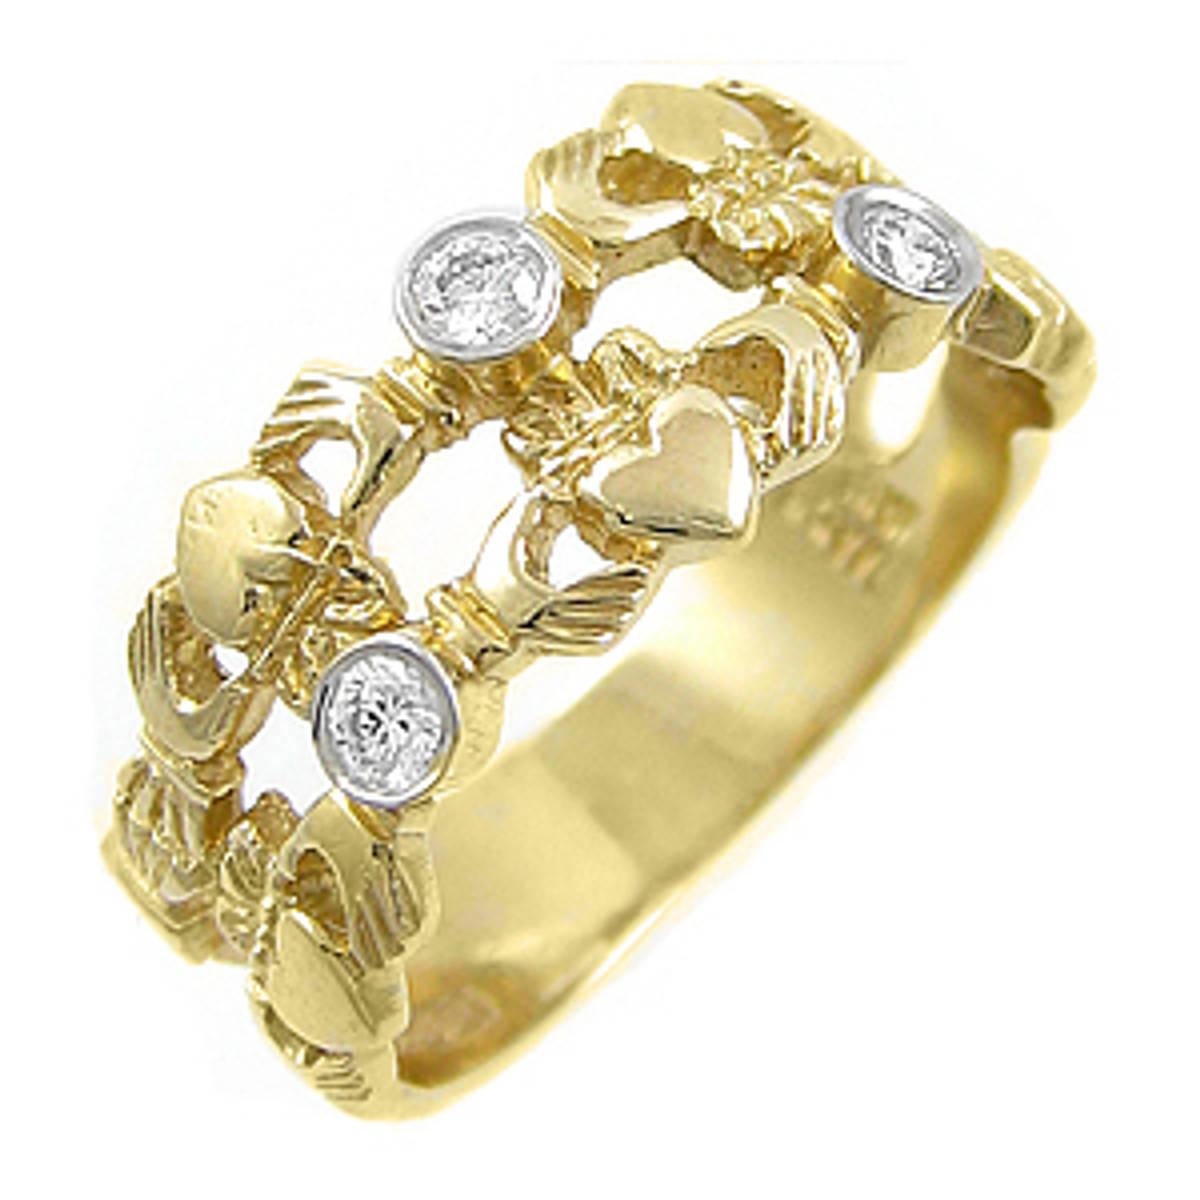 Irish made14 carat yellow gold 0.18cts diamonds claddagh engagement ring